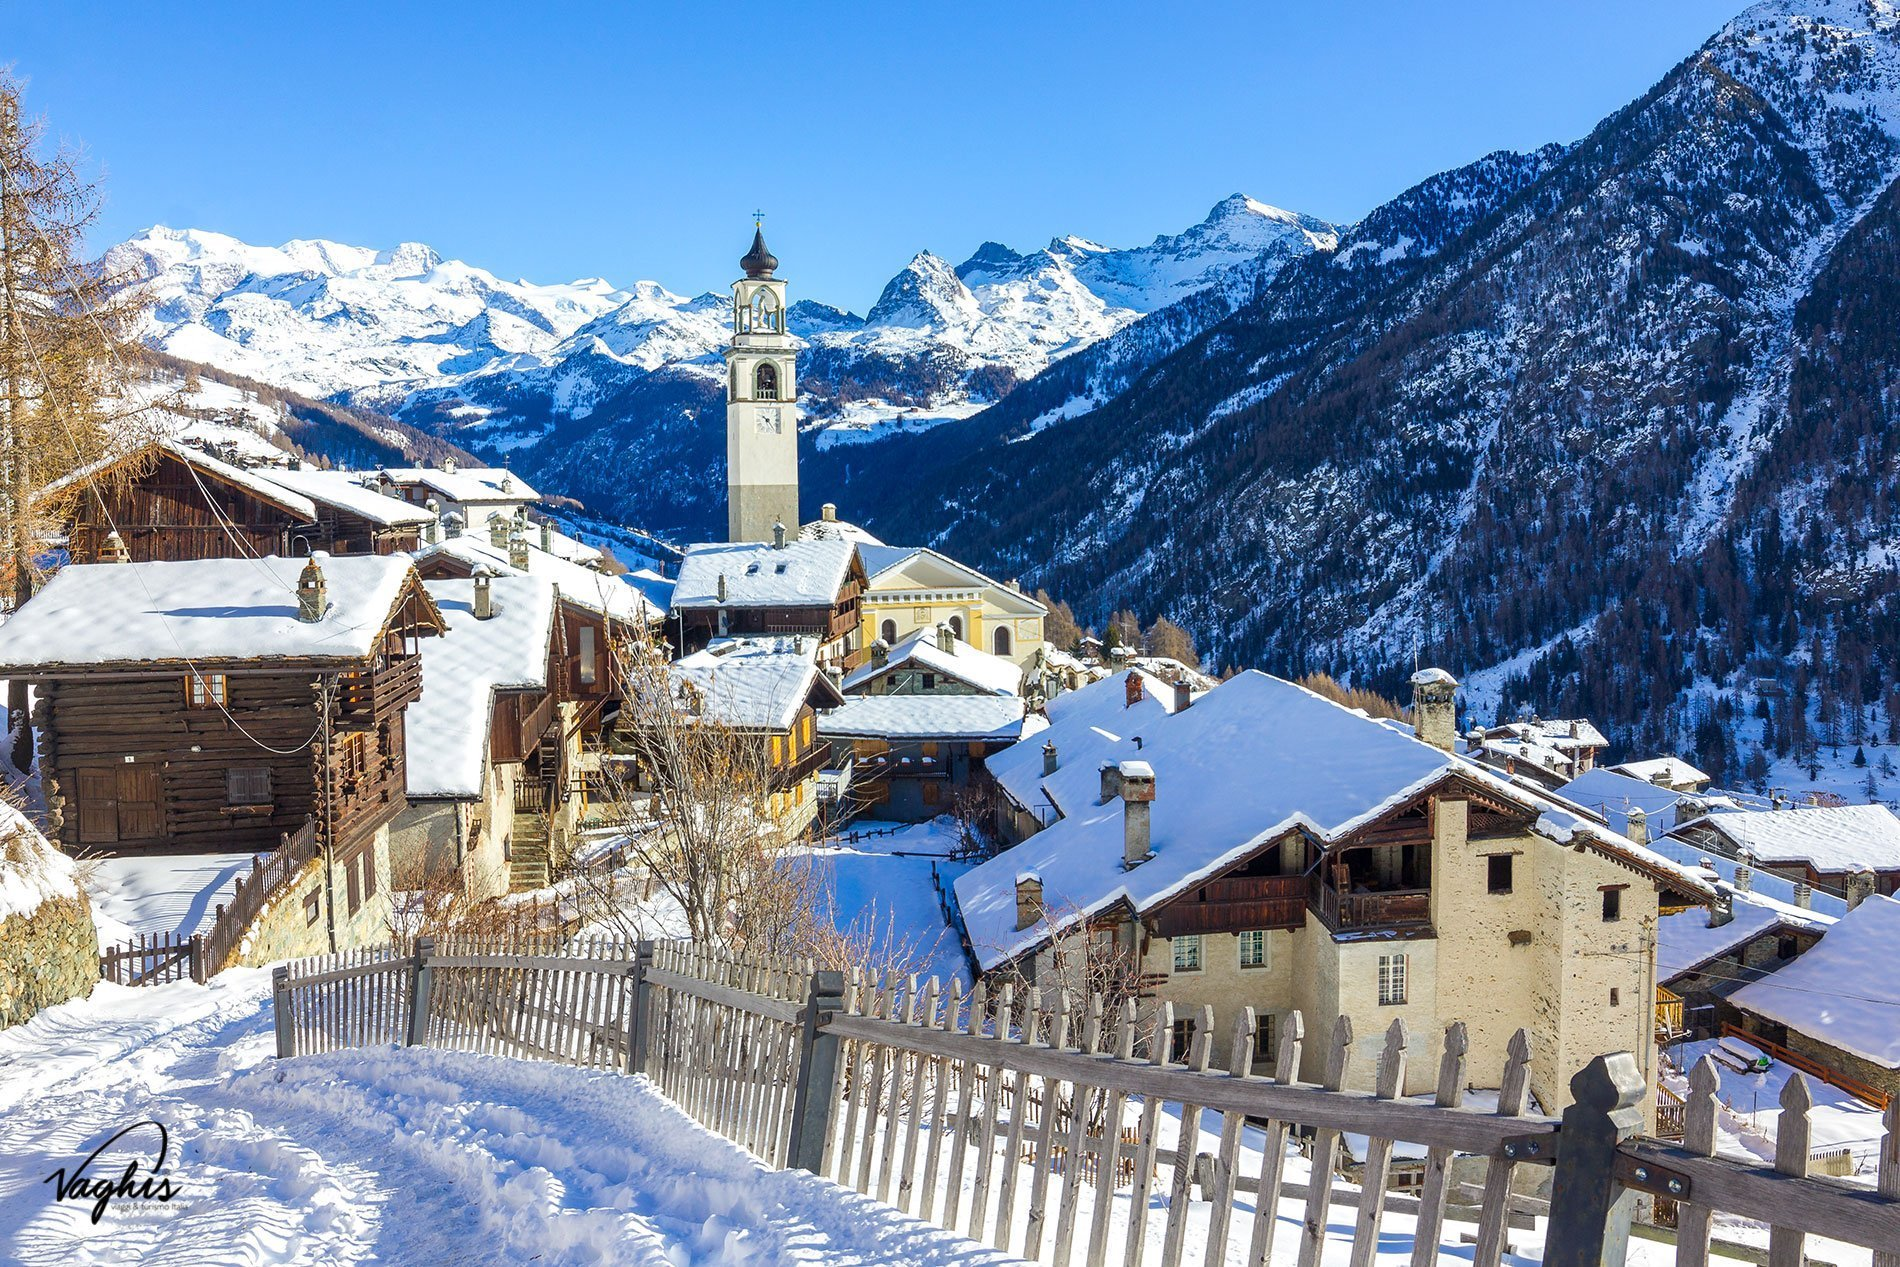 Antagnod - © Vaghis - Viaggi & turismo Italia - Tutti i diritti riservati